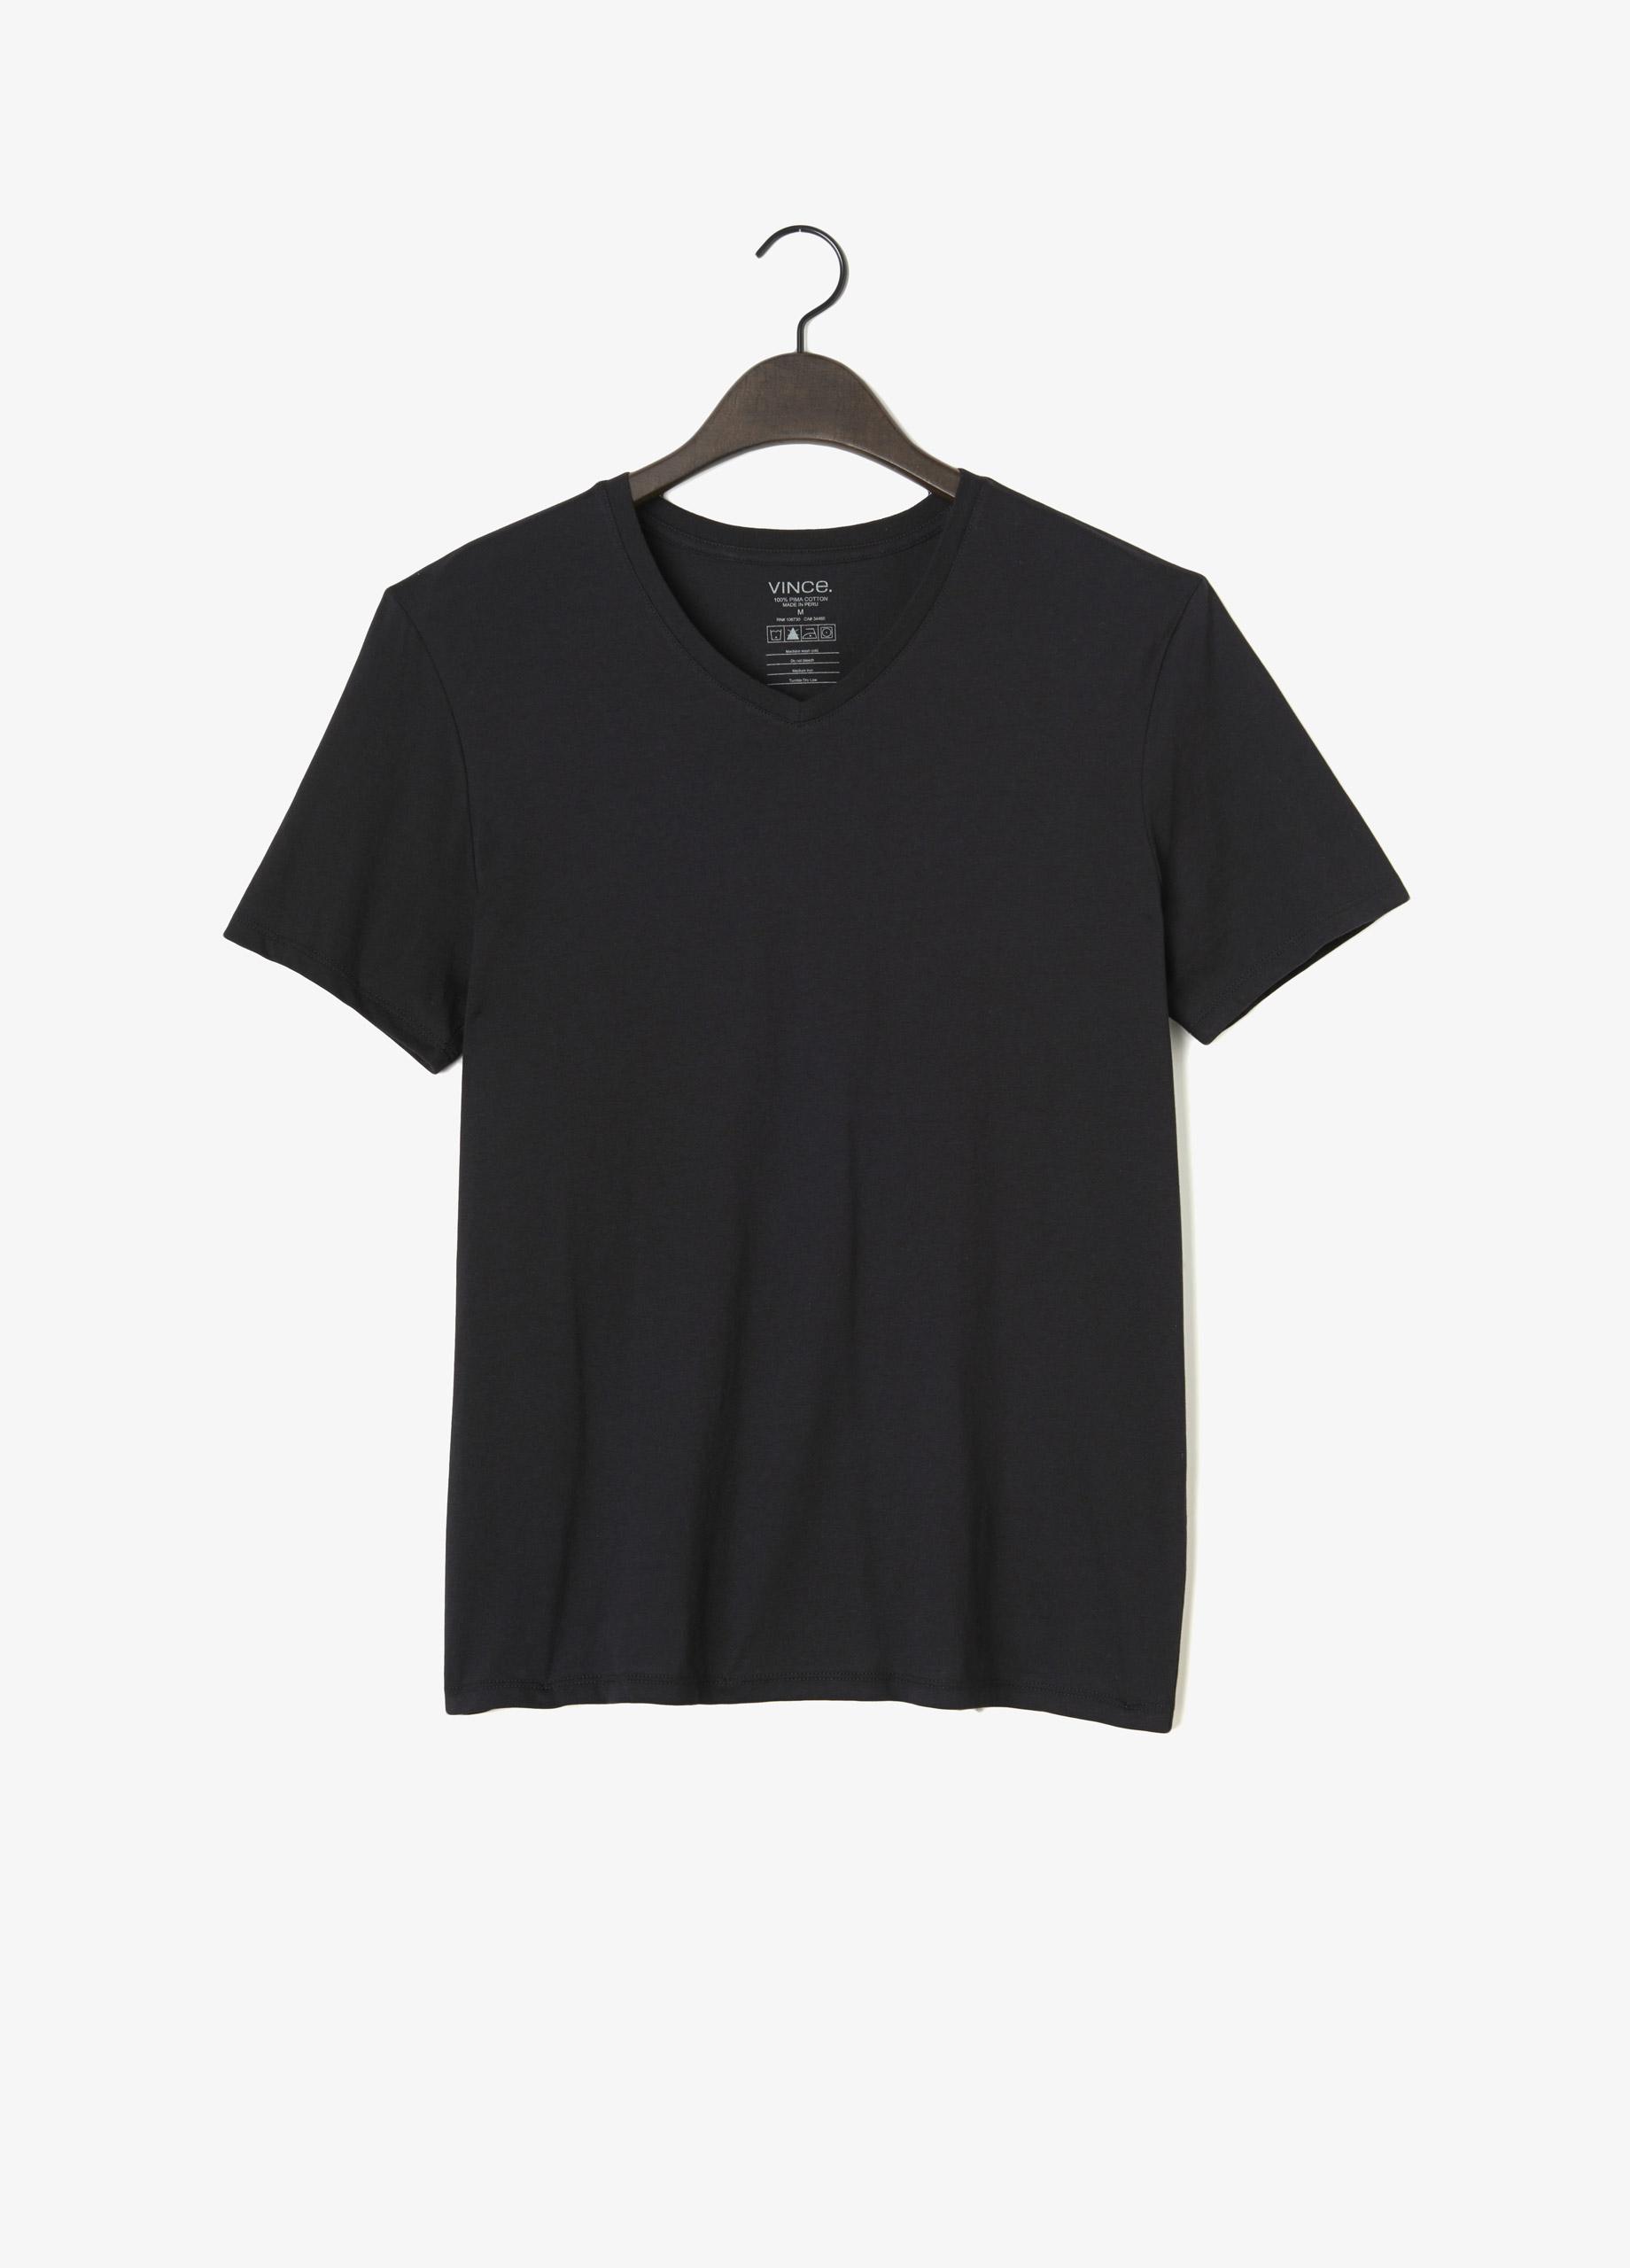 b8a936b76a7 Vince Black Favorite Jersey V-neck Tee